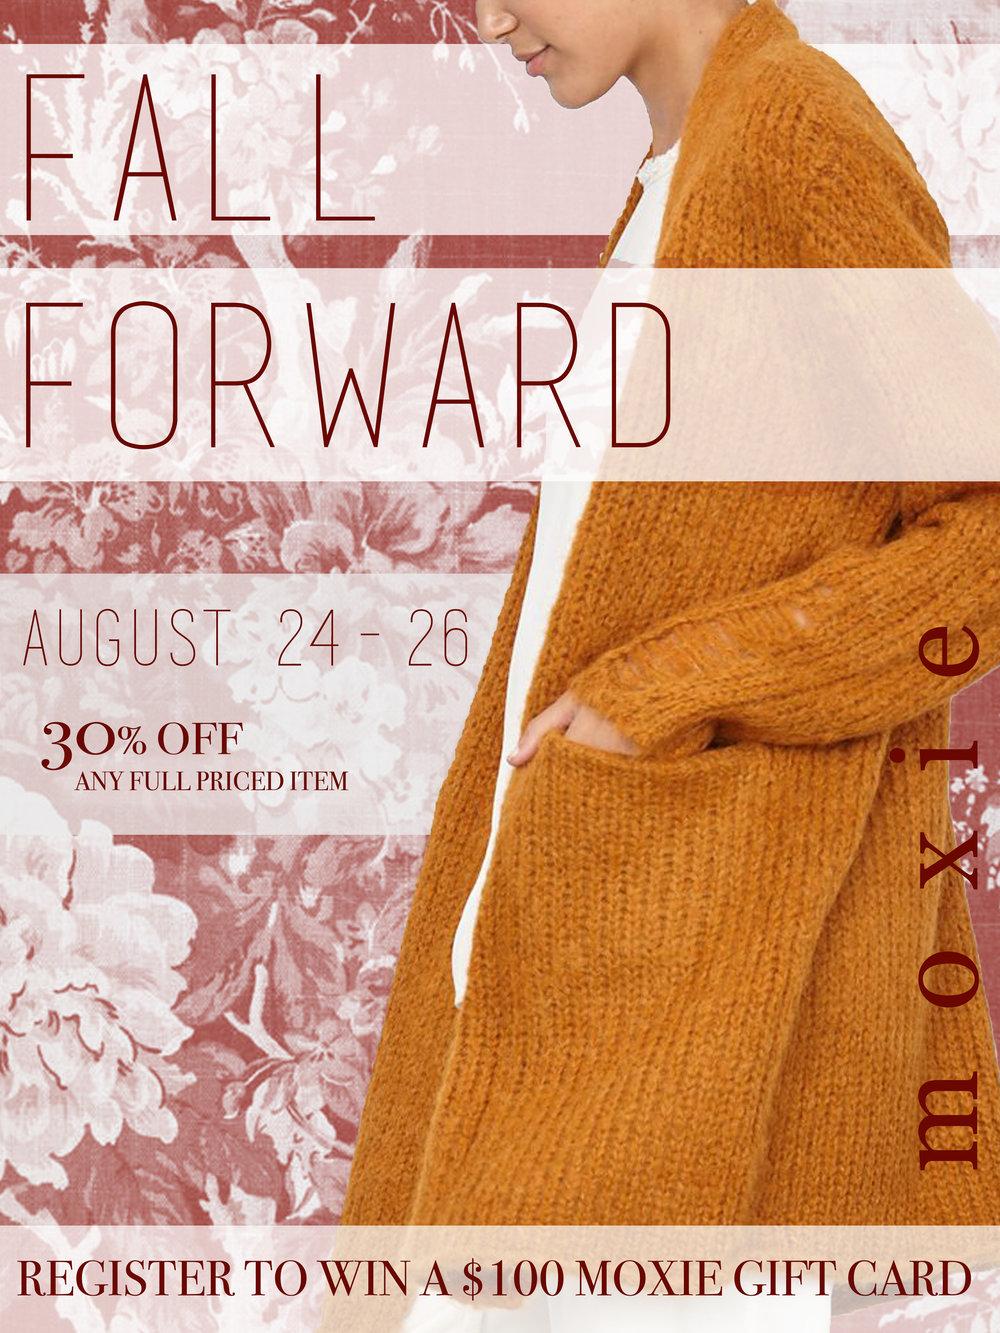 Fall Forward Coupon.jpg